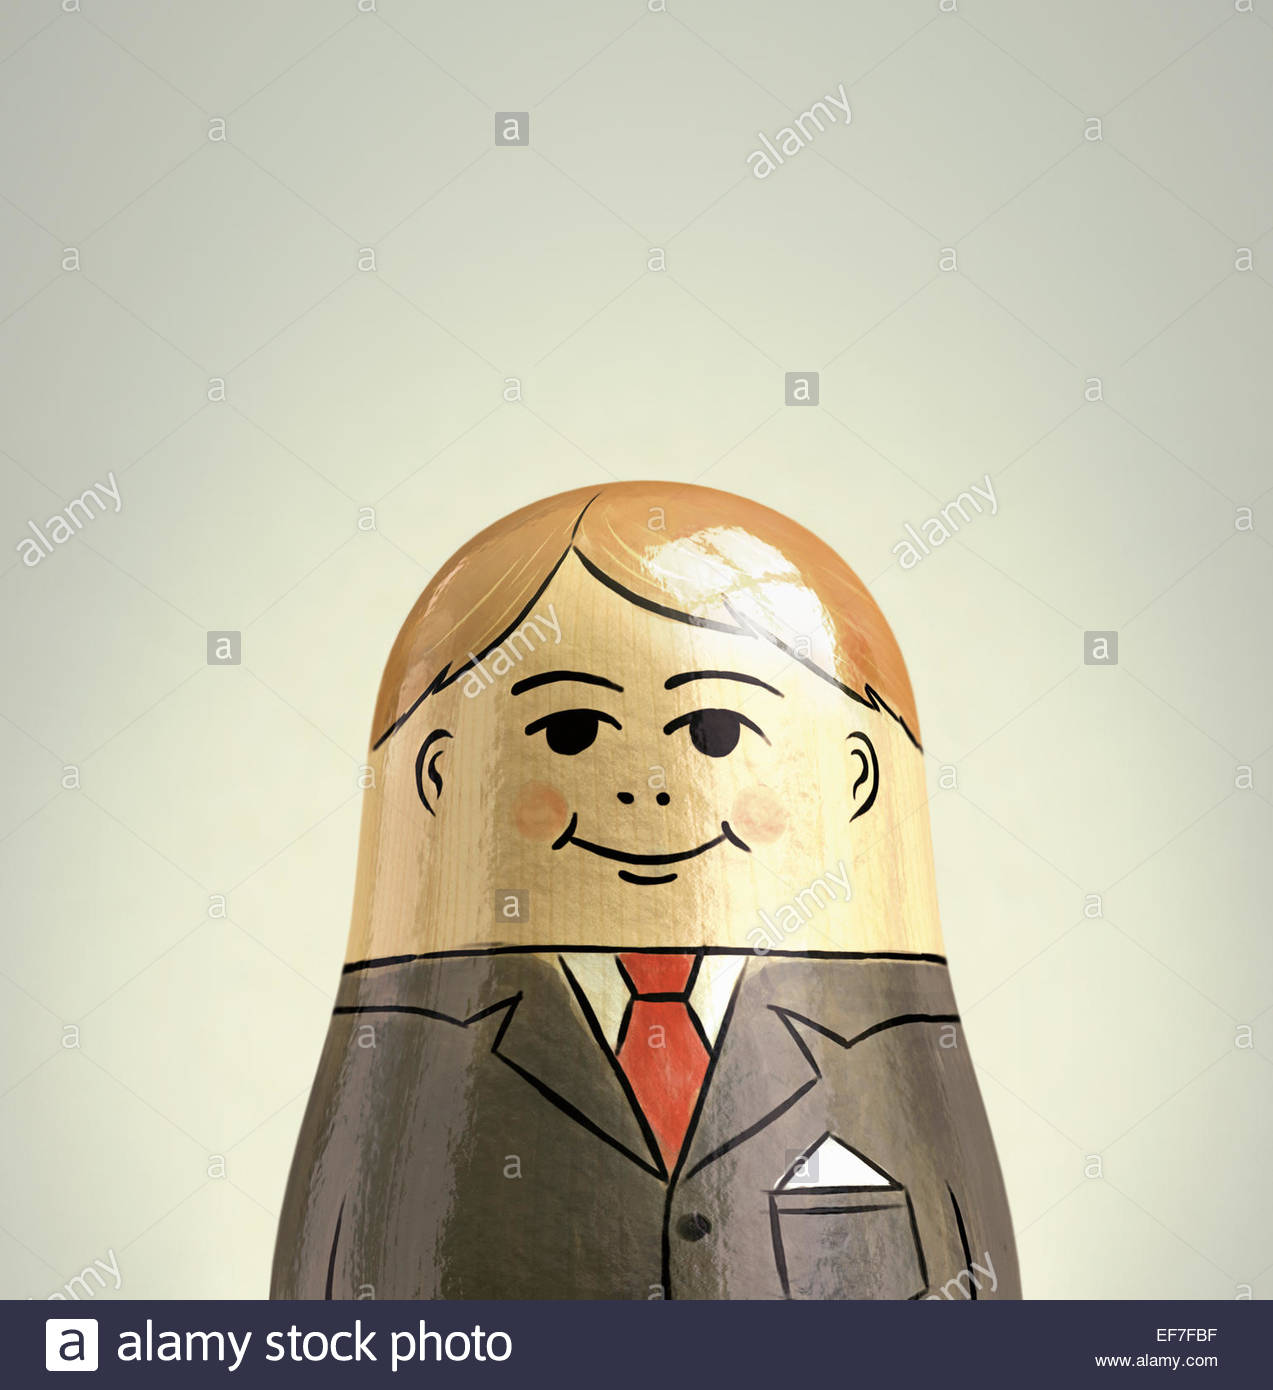 Glücklich lächelnd Geschäftsmann Verschachtelung Puppe Stockbild